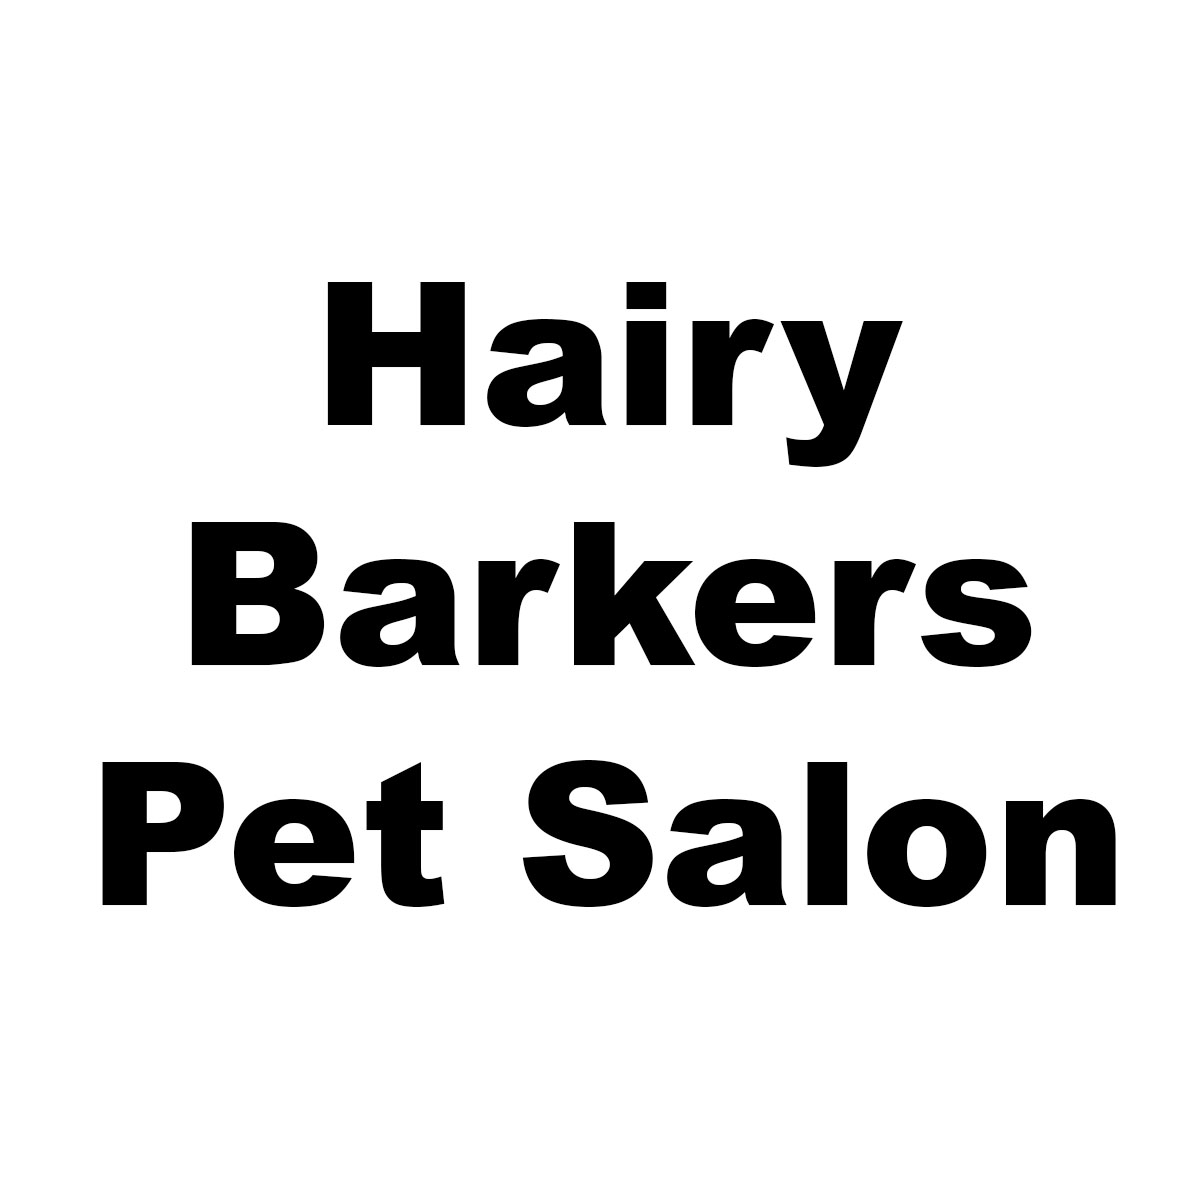 hairybarkers.jpg